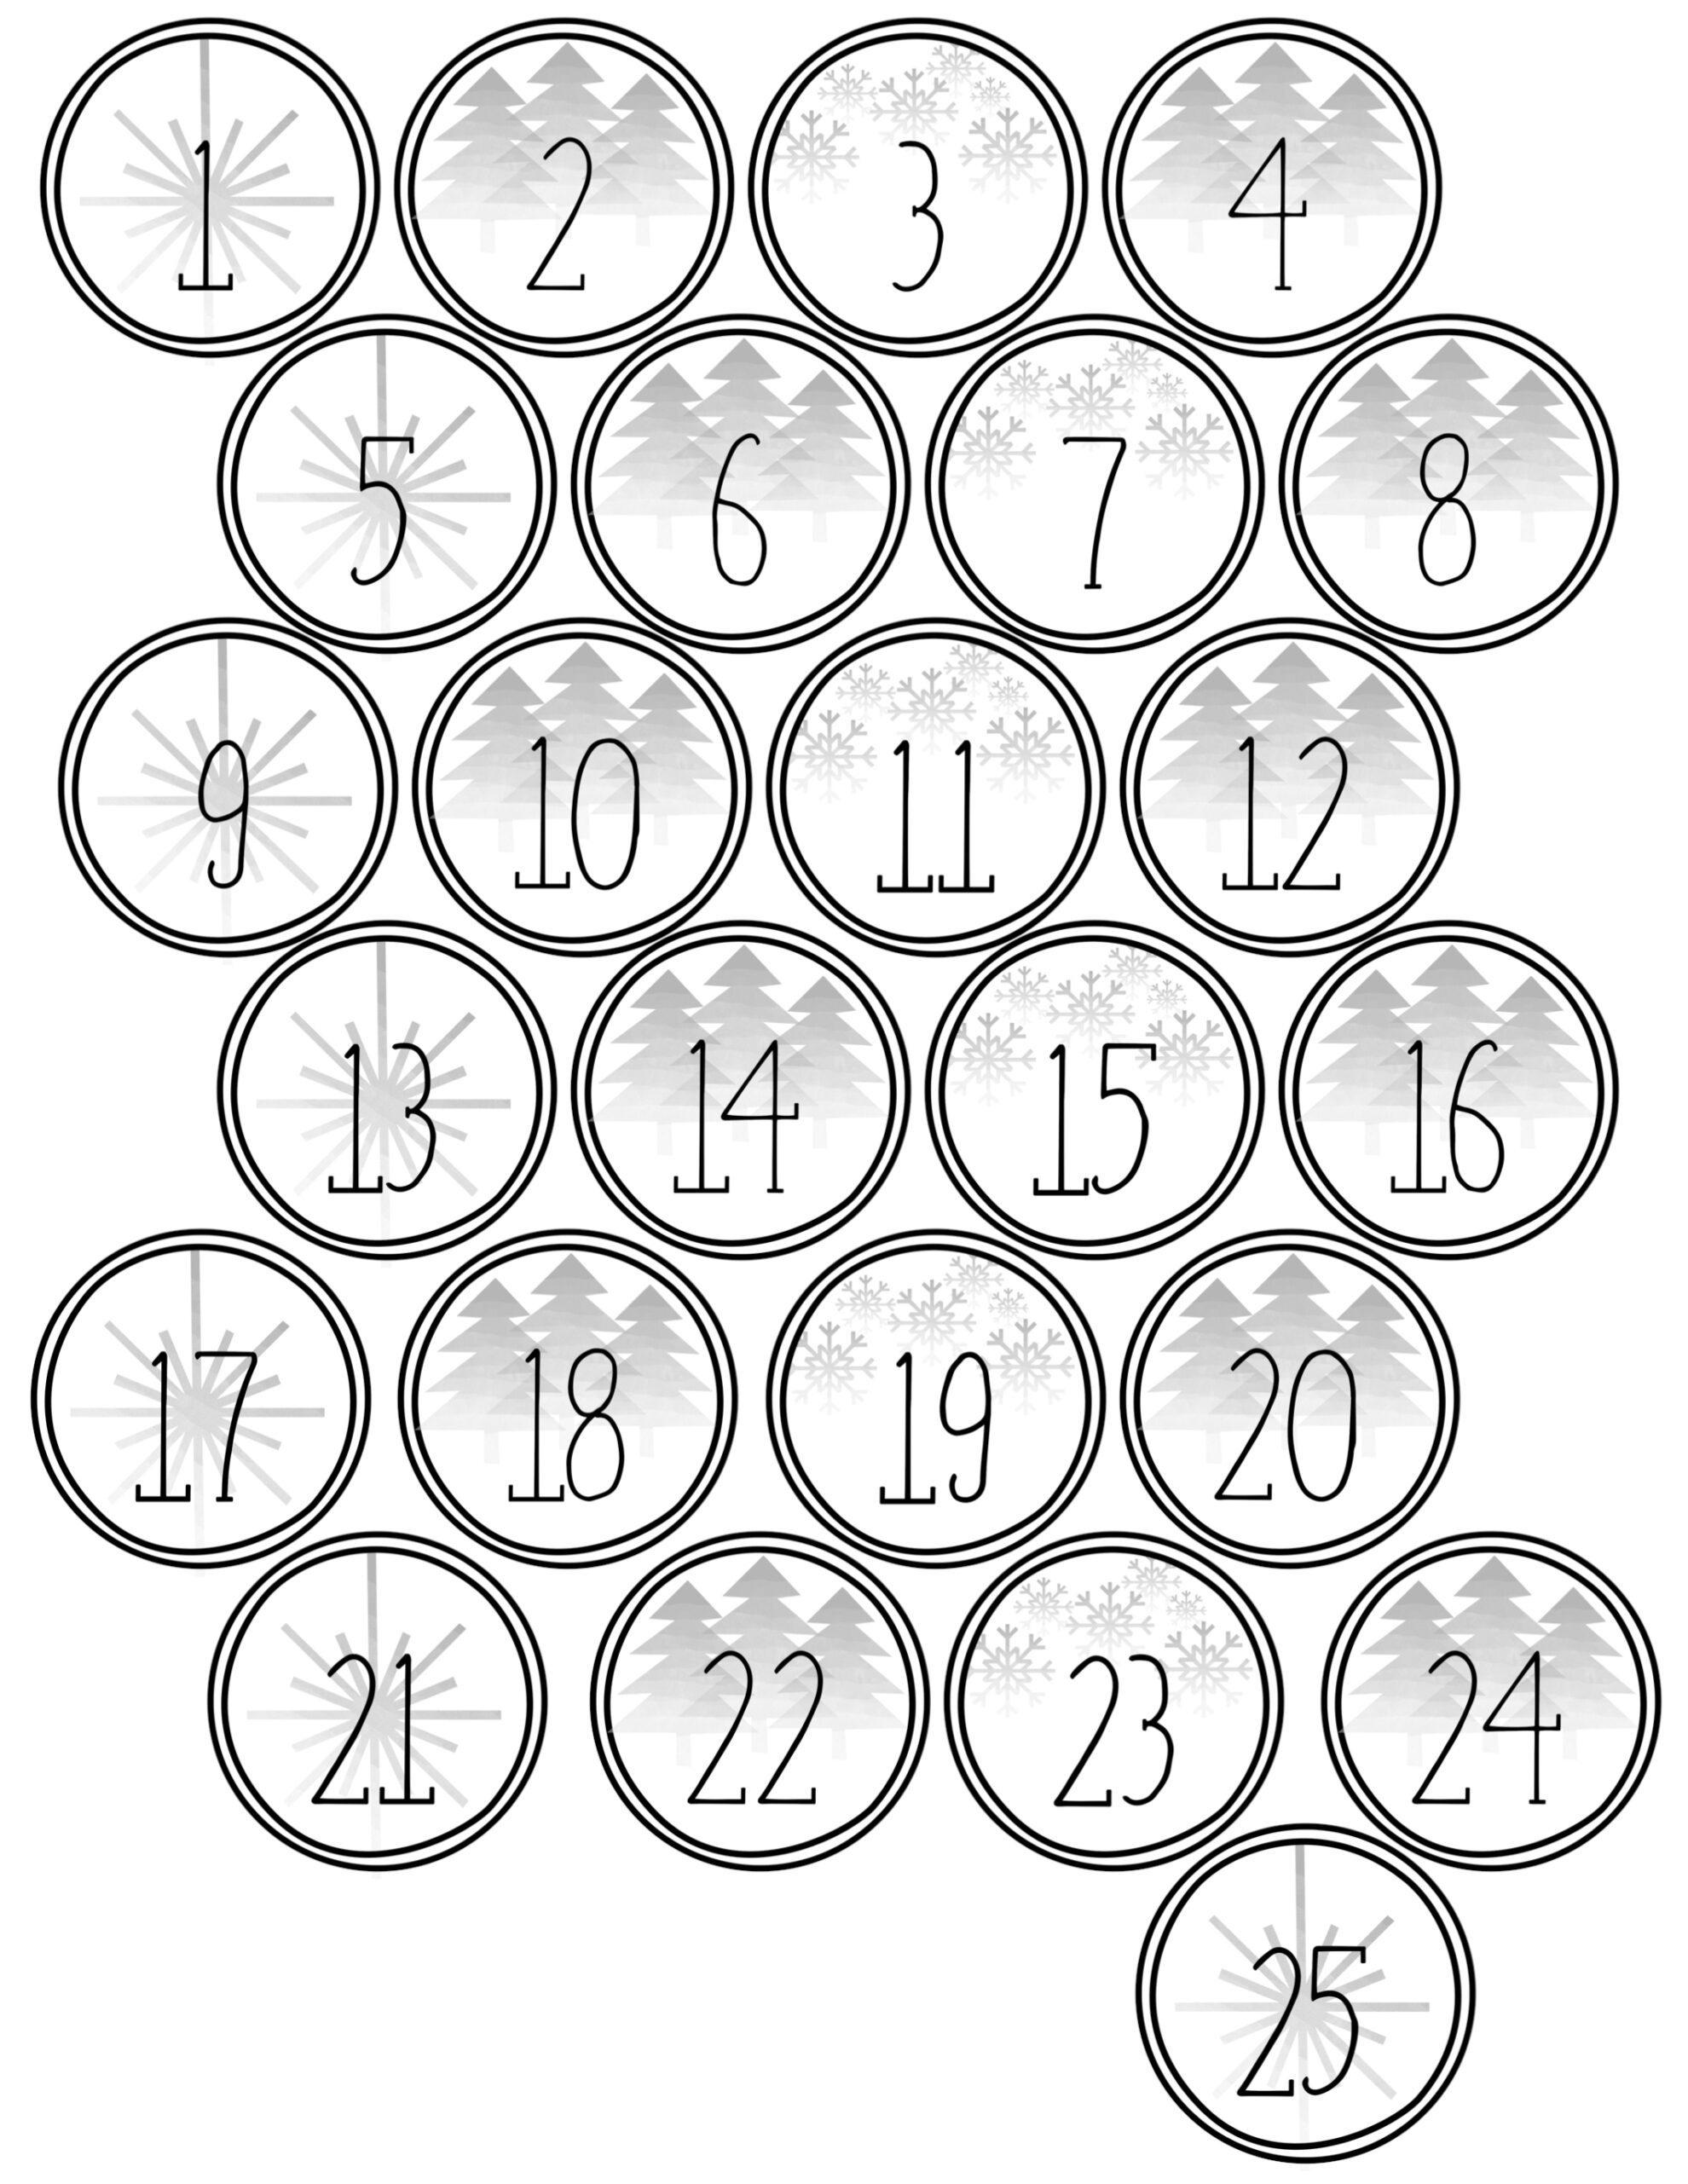 Christmas Advent Calendar Printable Numbers - Paper Trail Design - Free Printable Advent Numbers